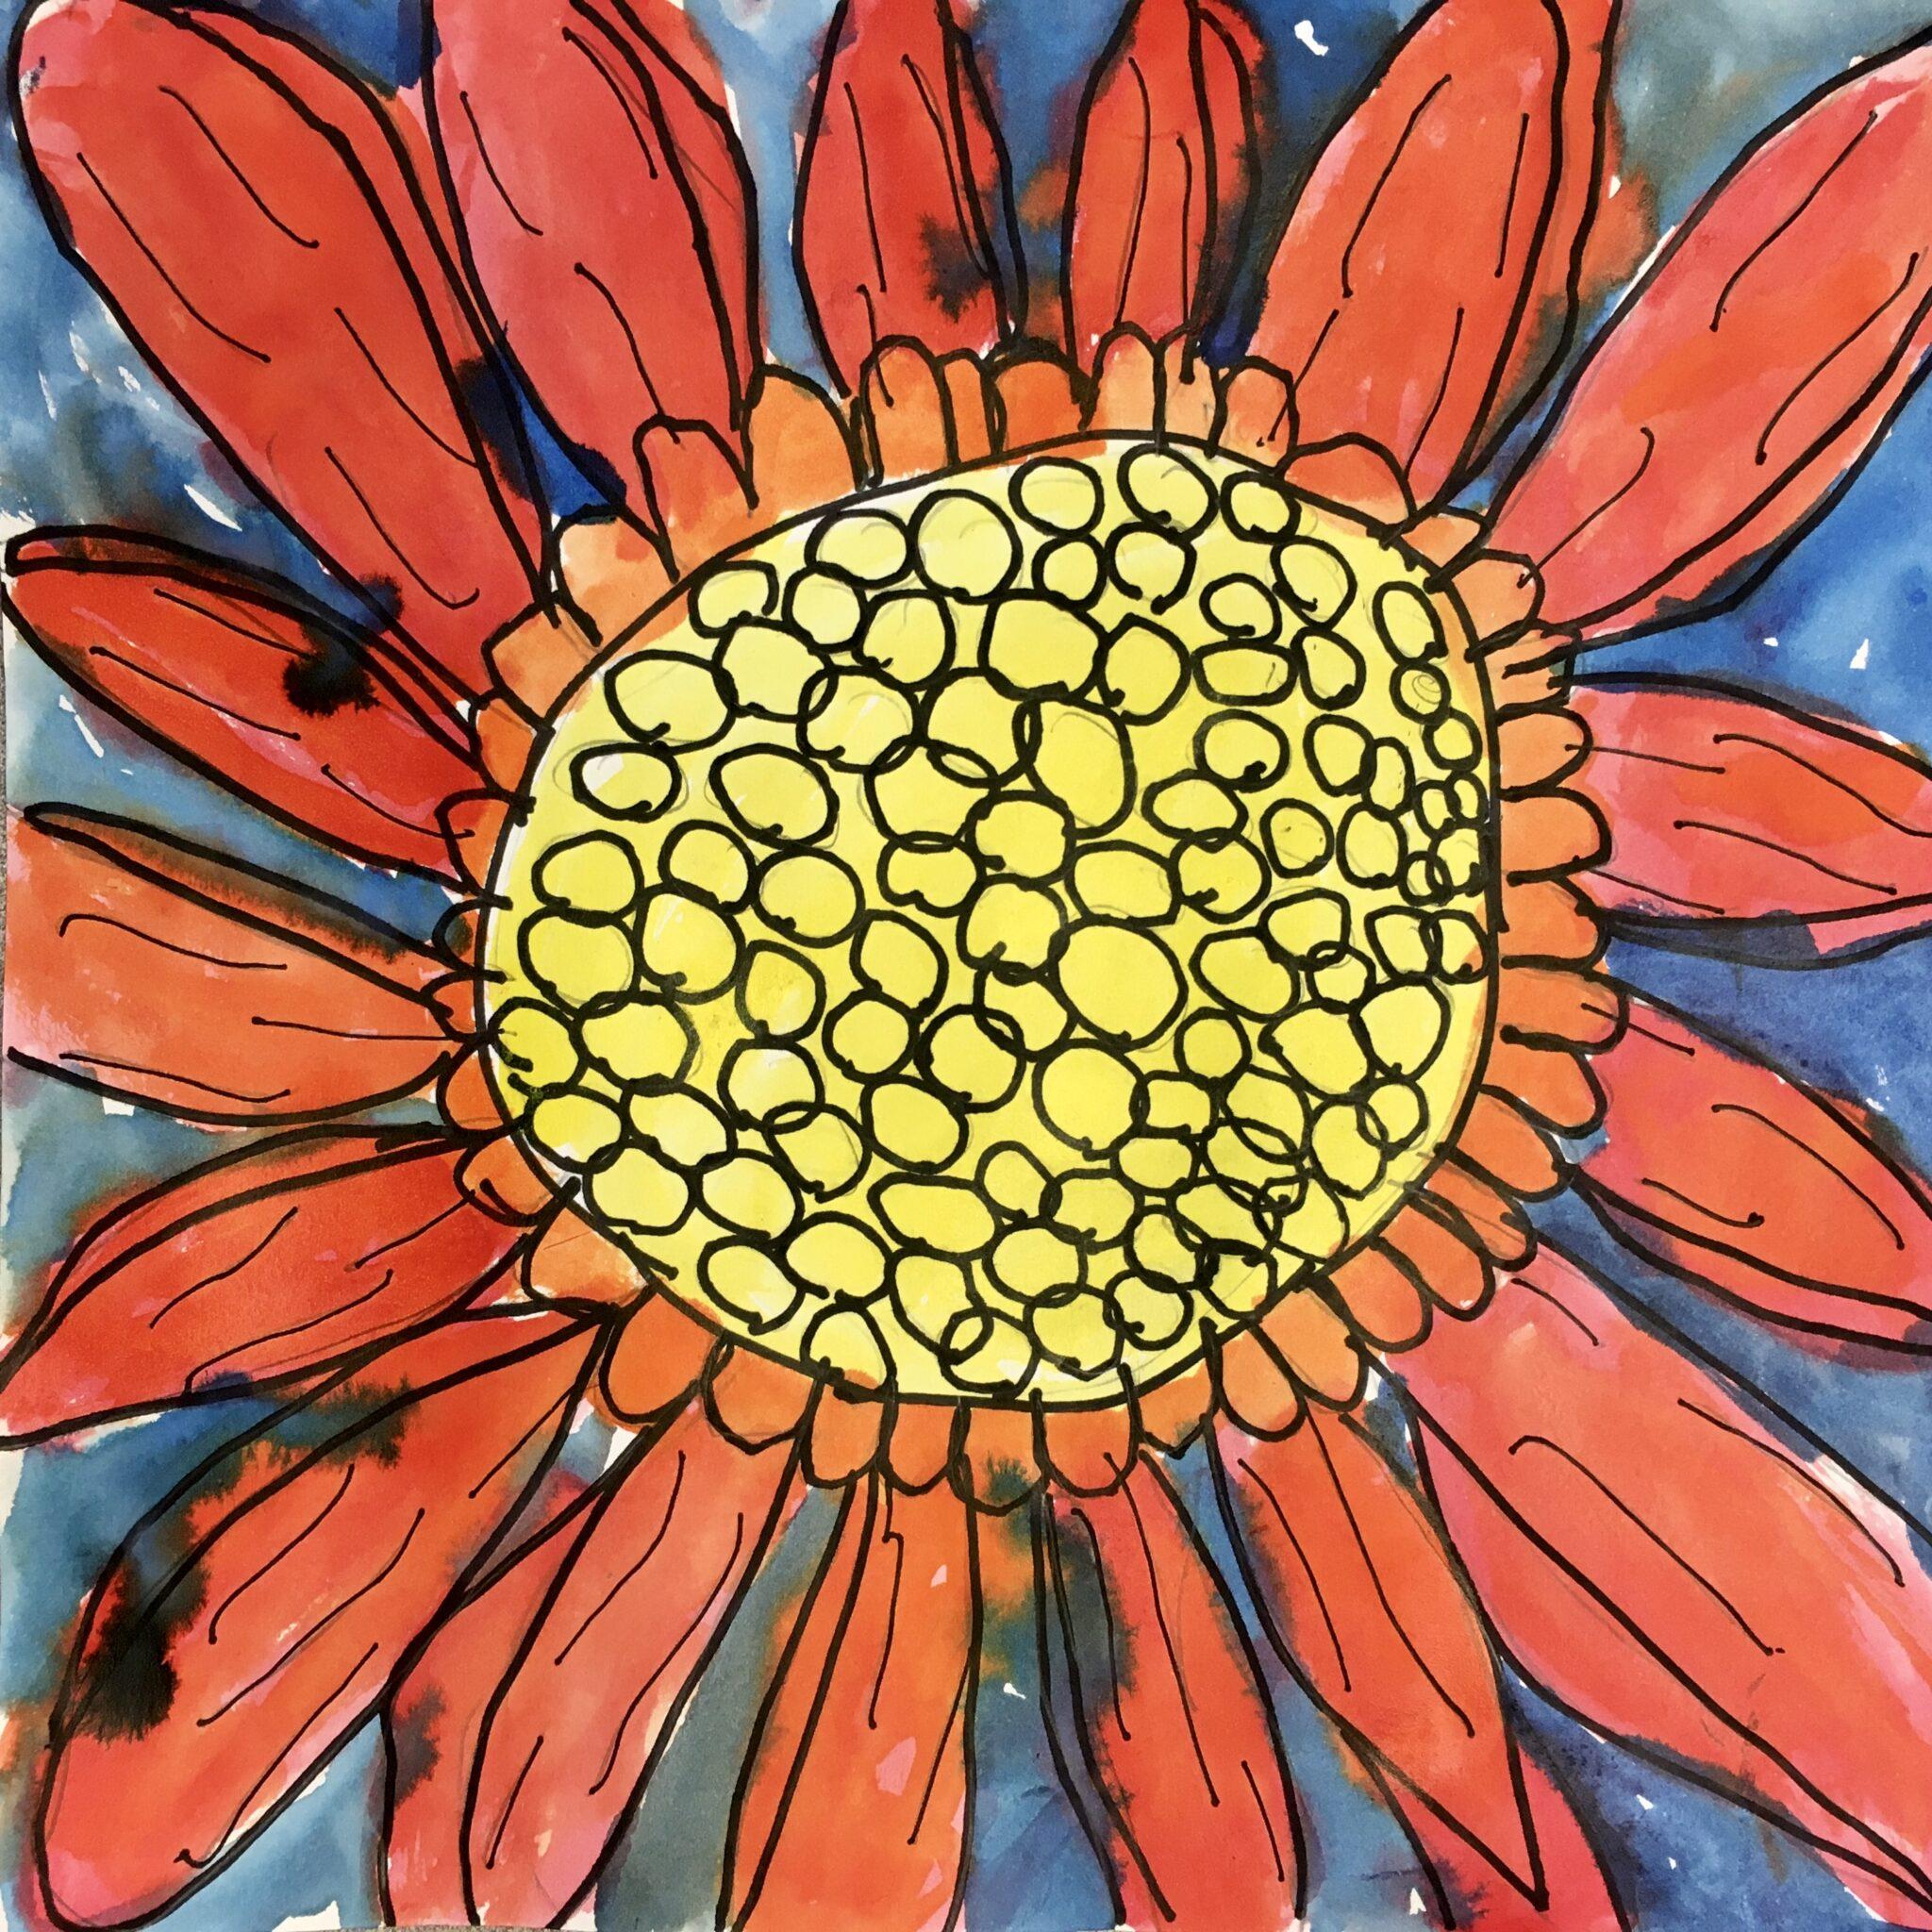 student art of a flower